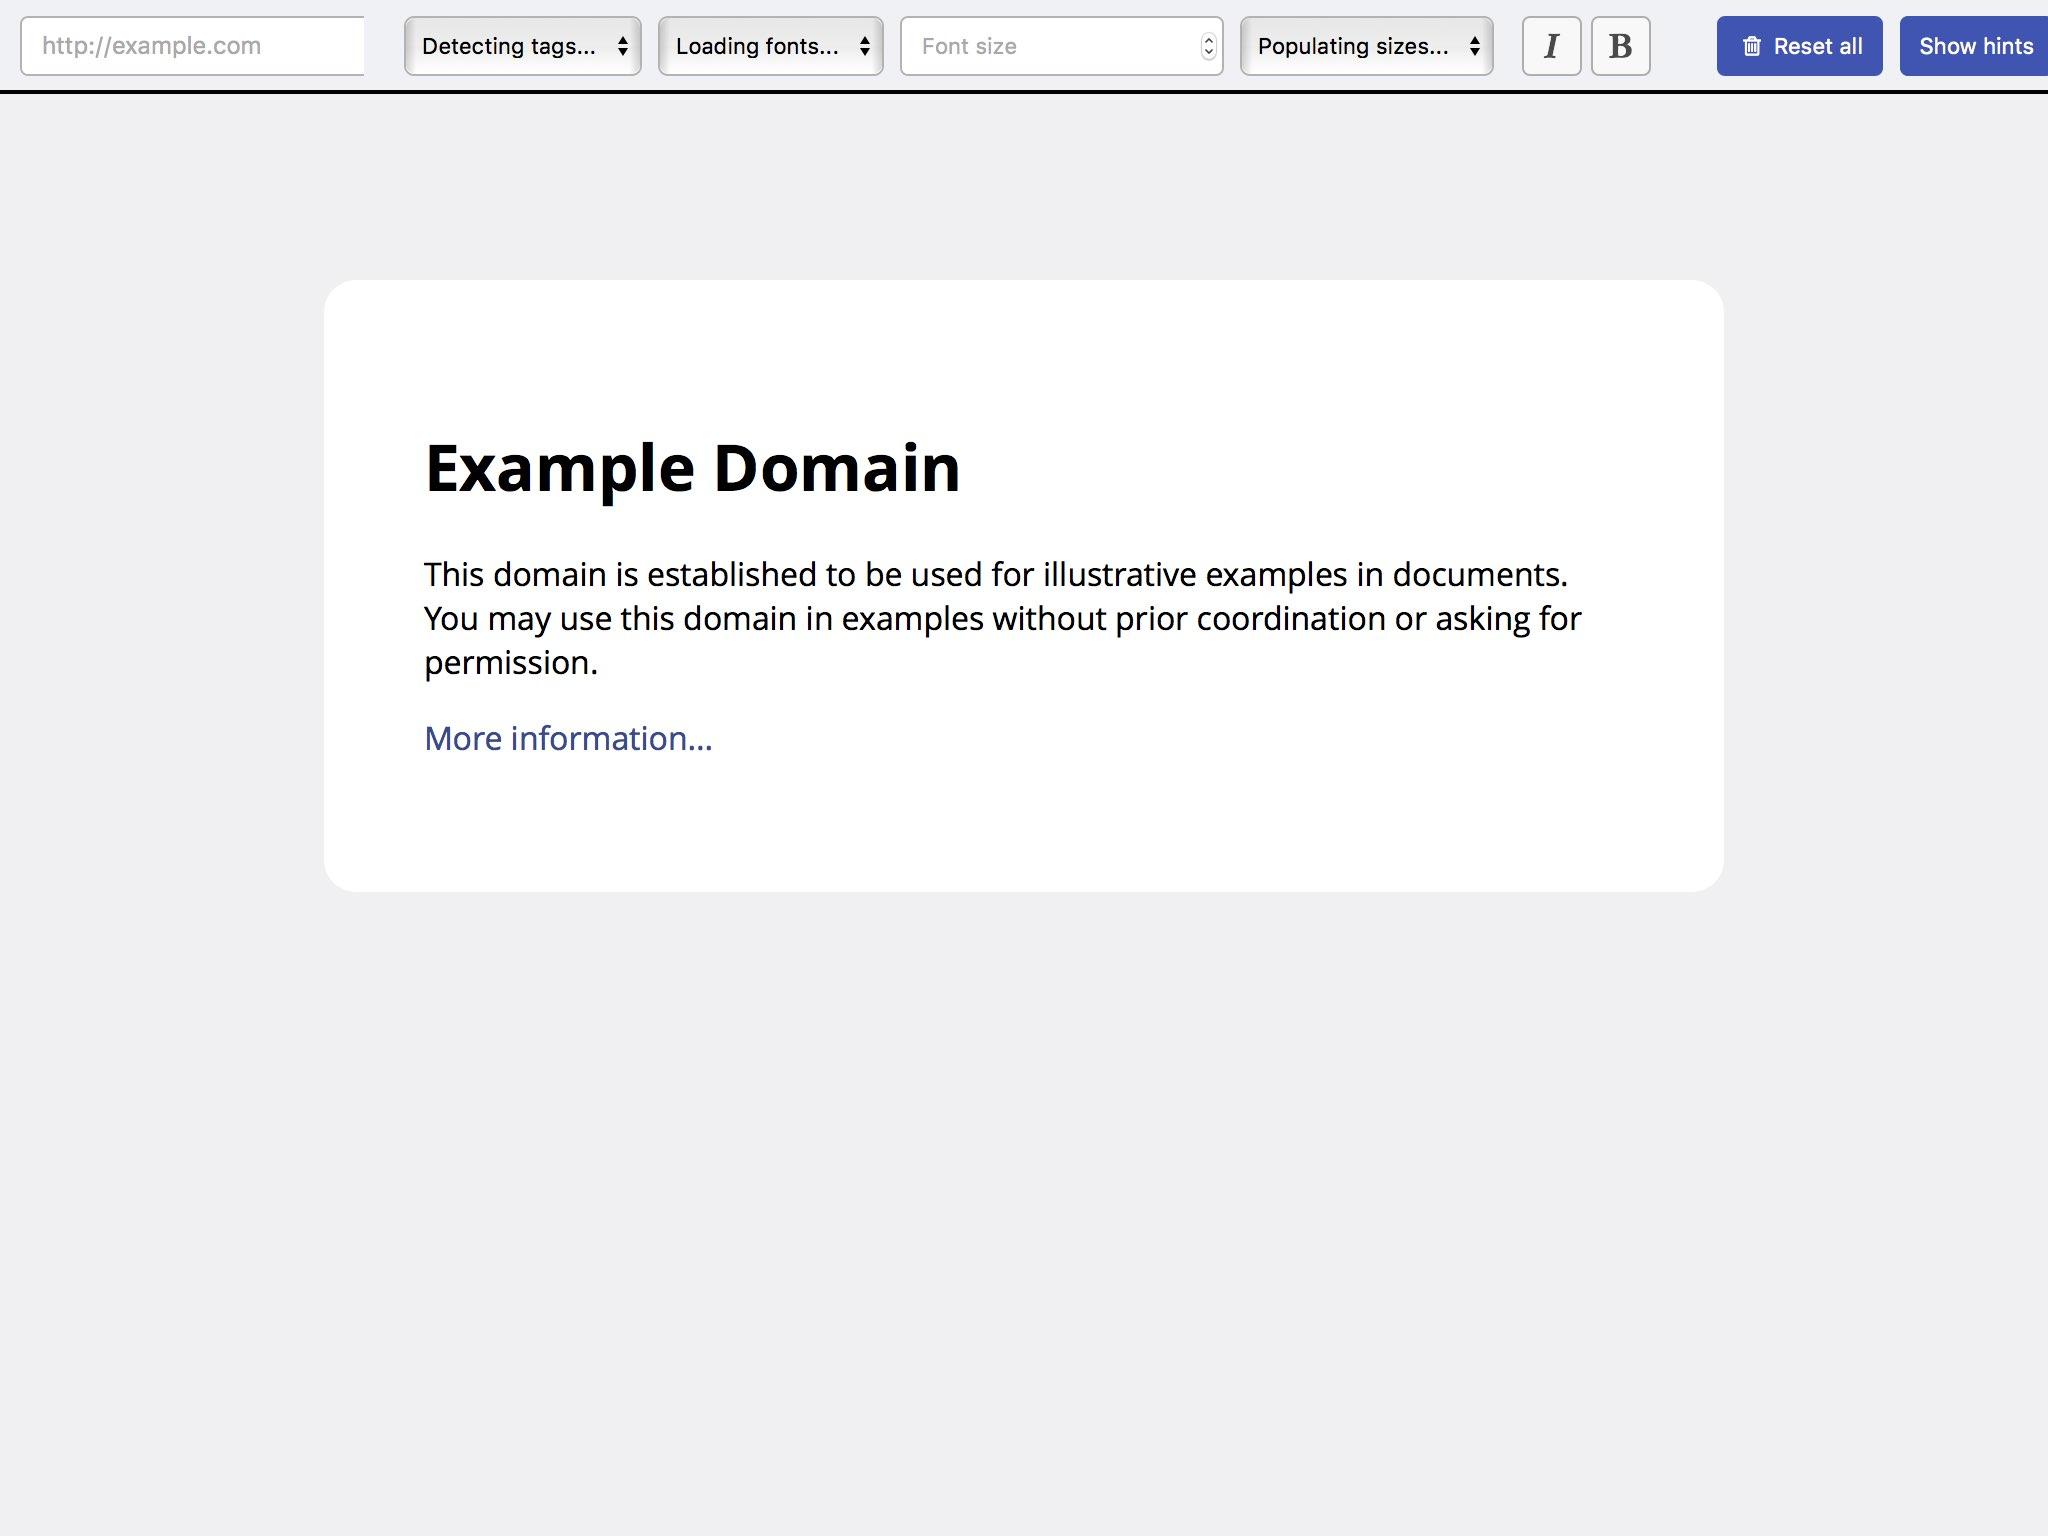 Example Domain